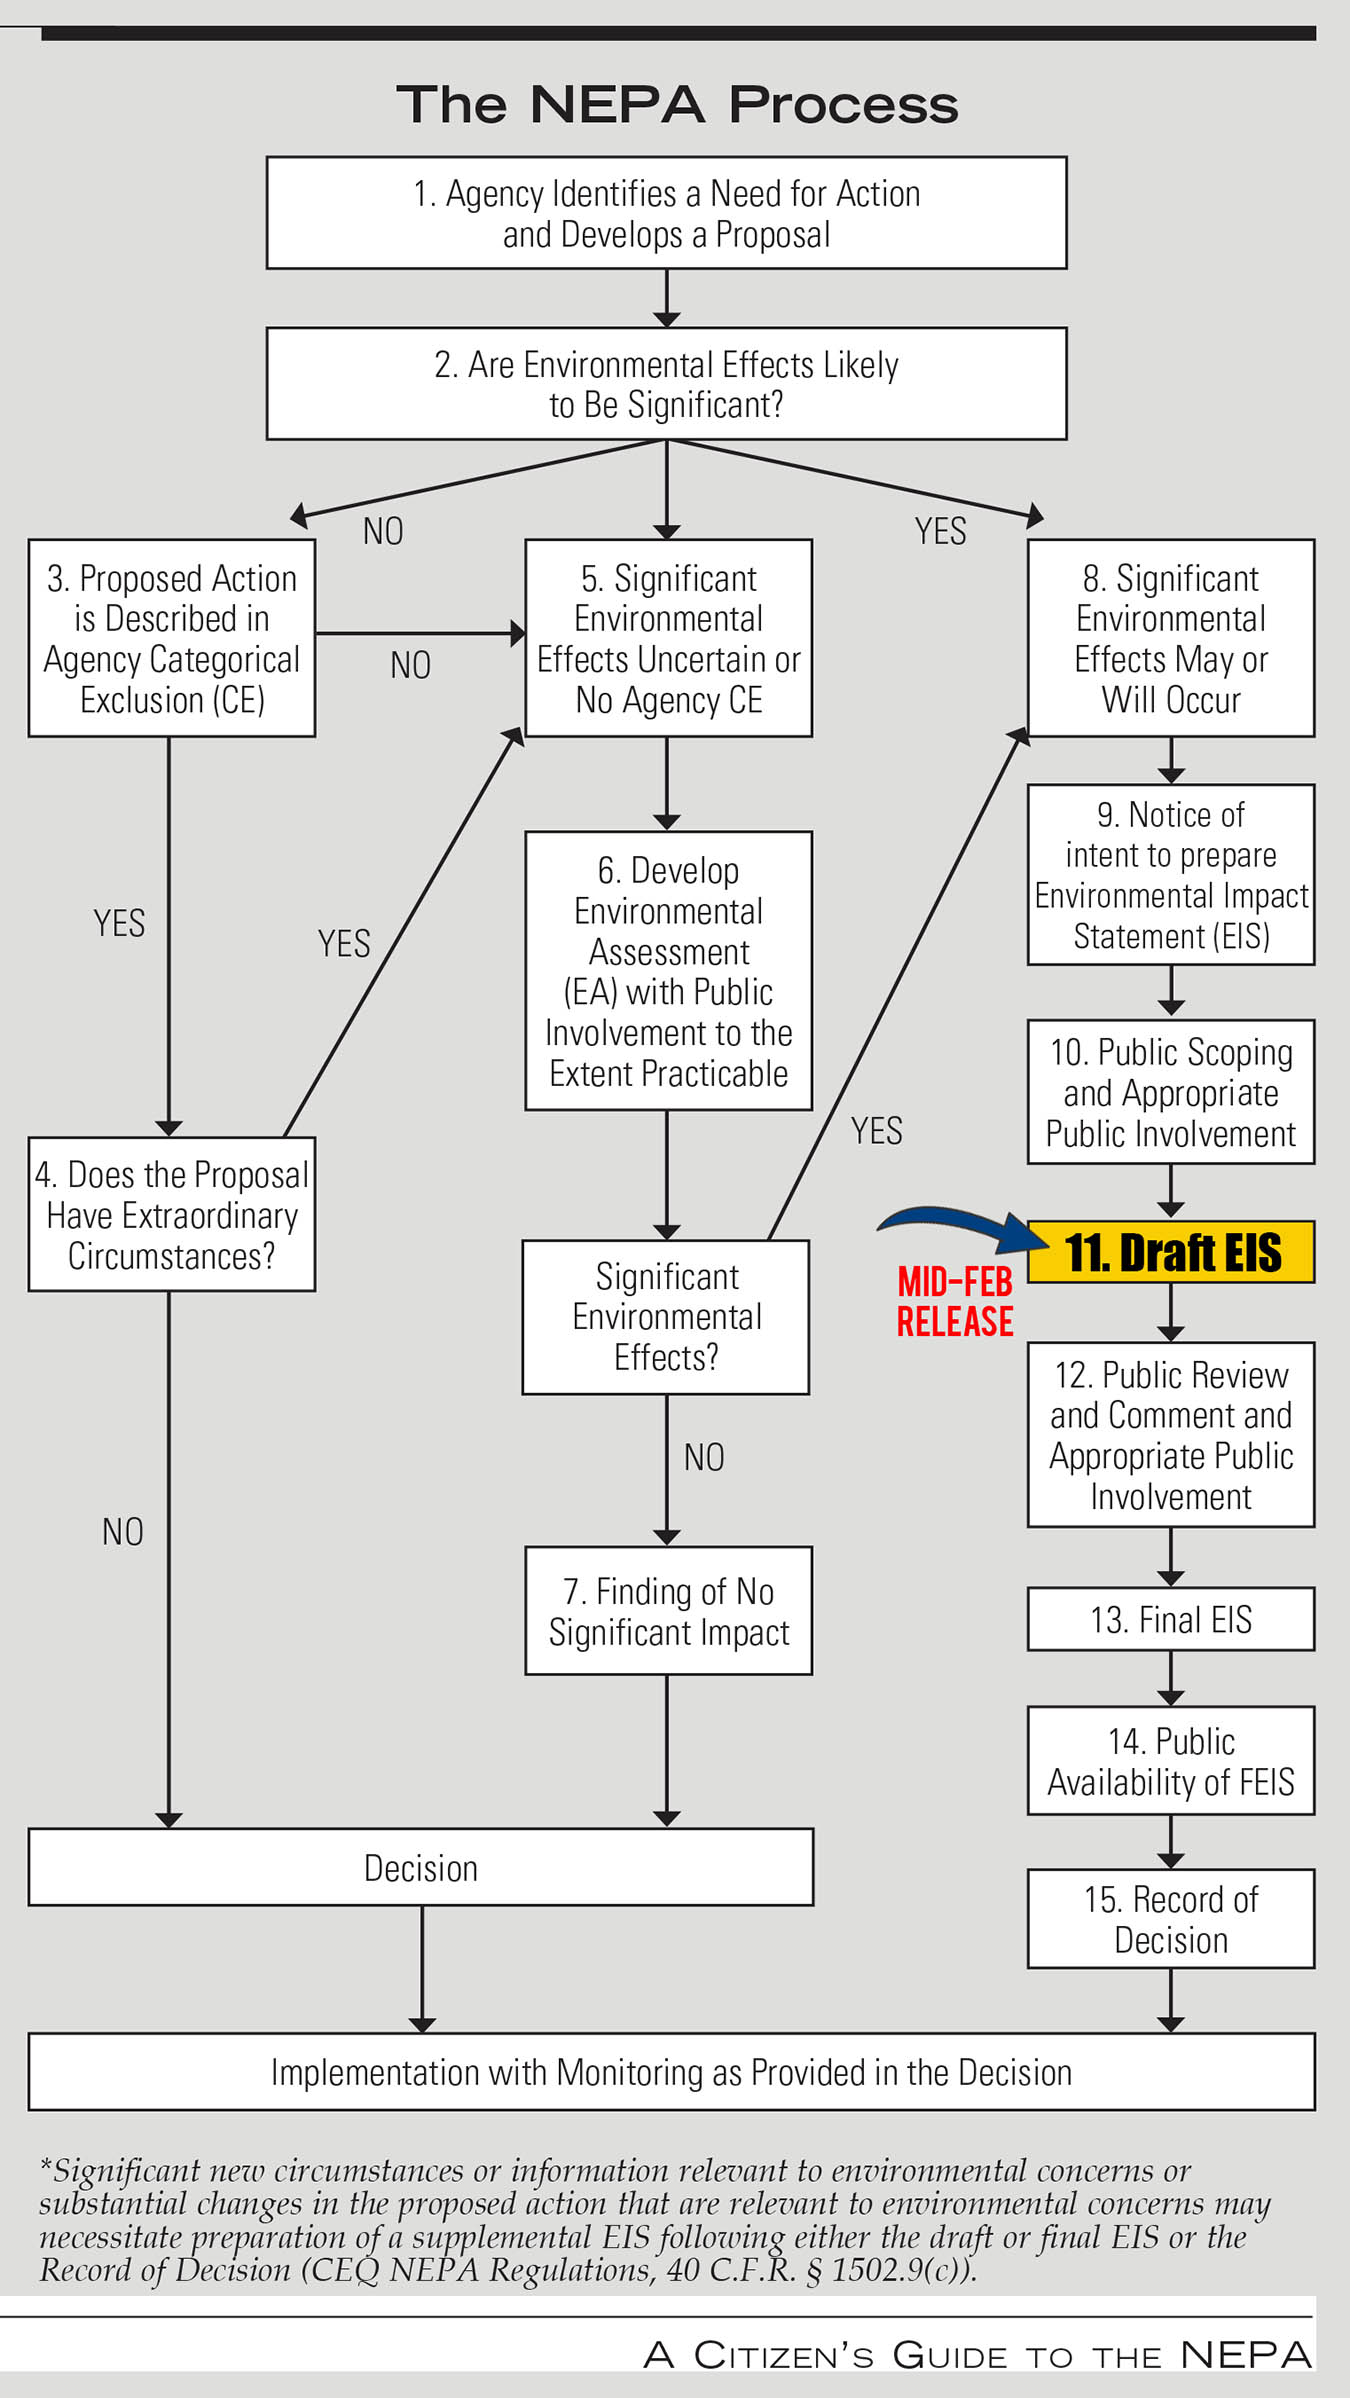 Citizens_Guide_NEPA_Process.jpg